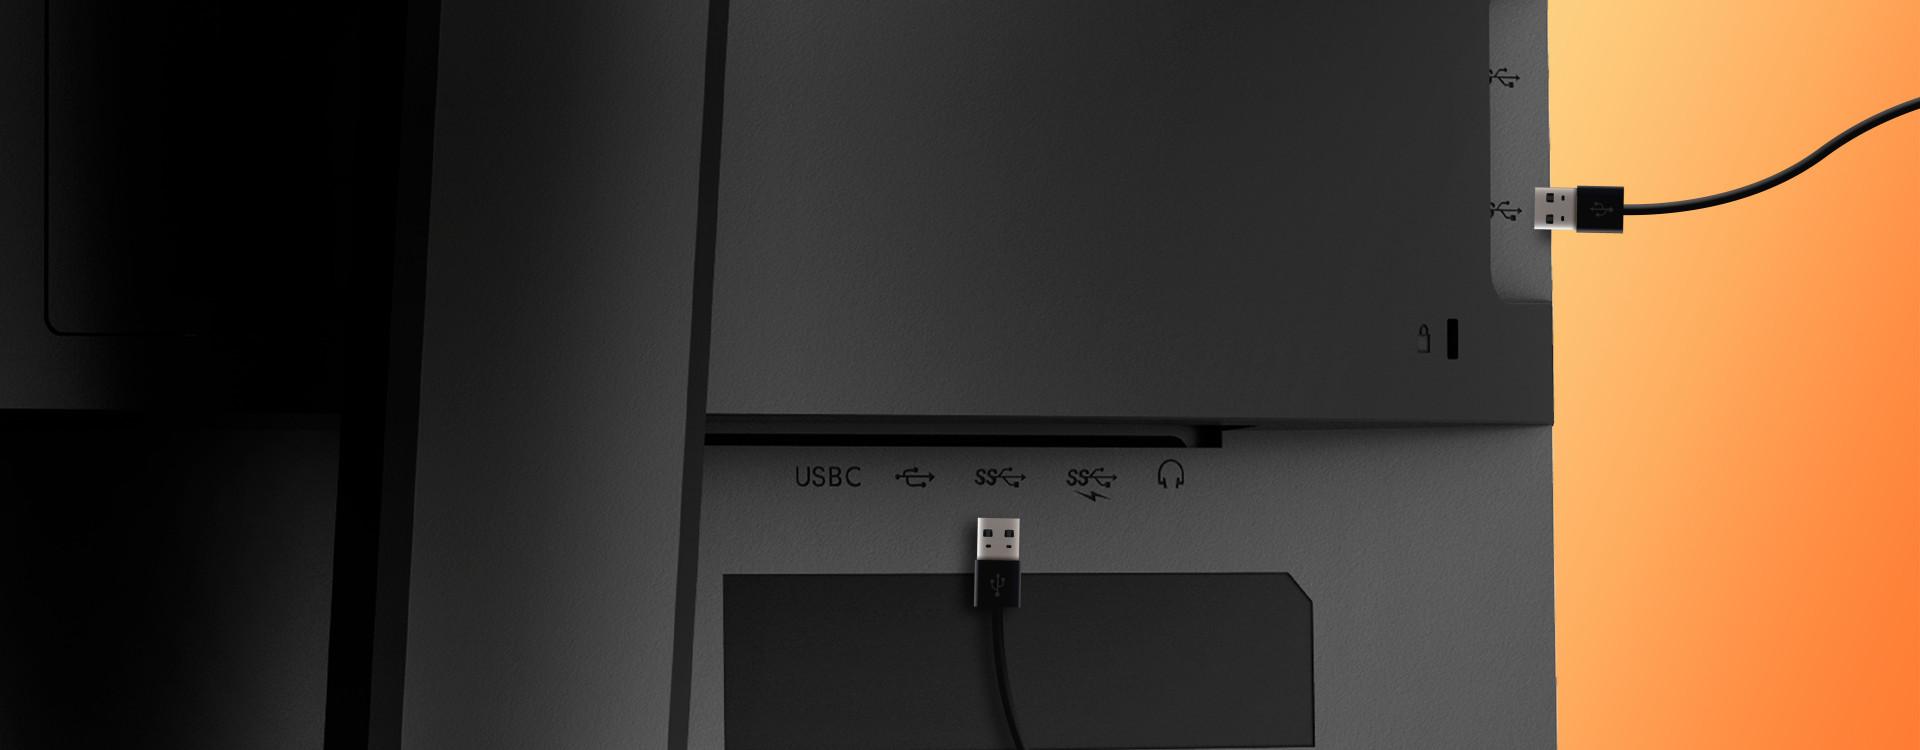 AOC_B2B_C_24P2_USB_HUB.jpg